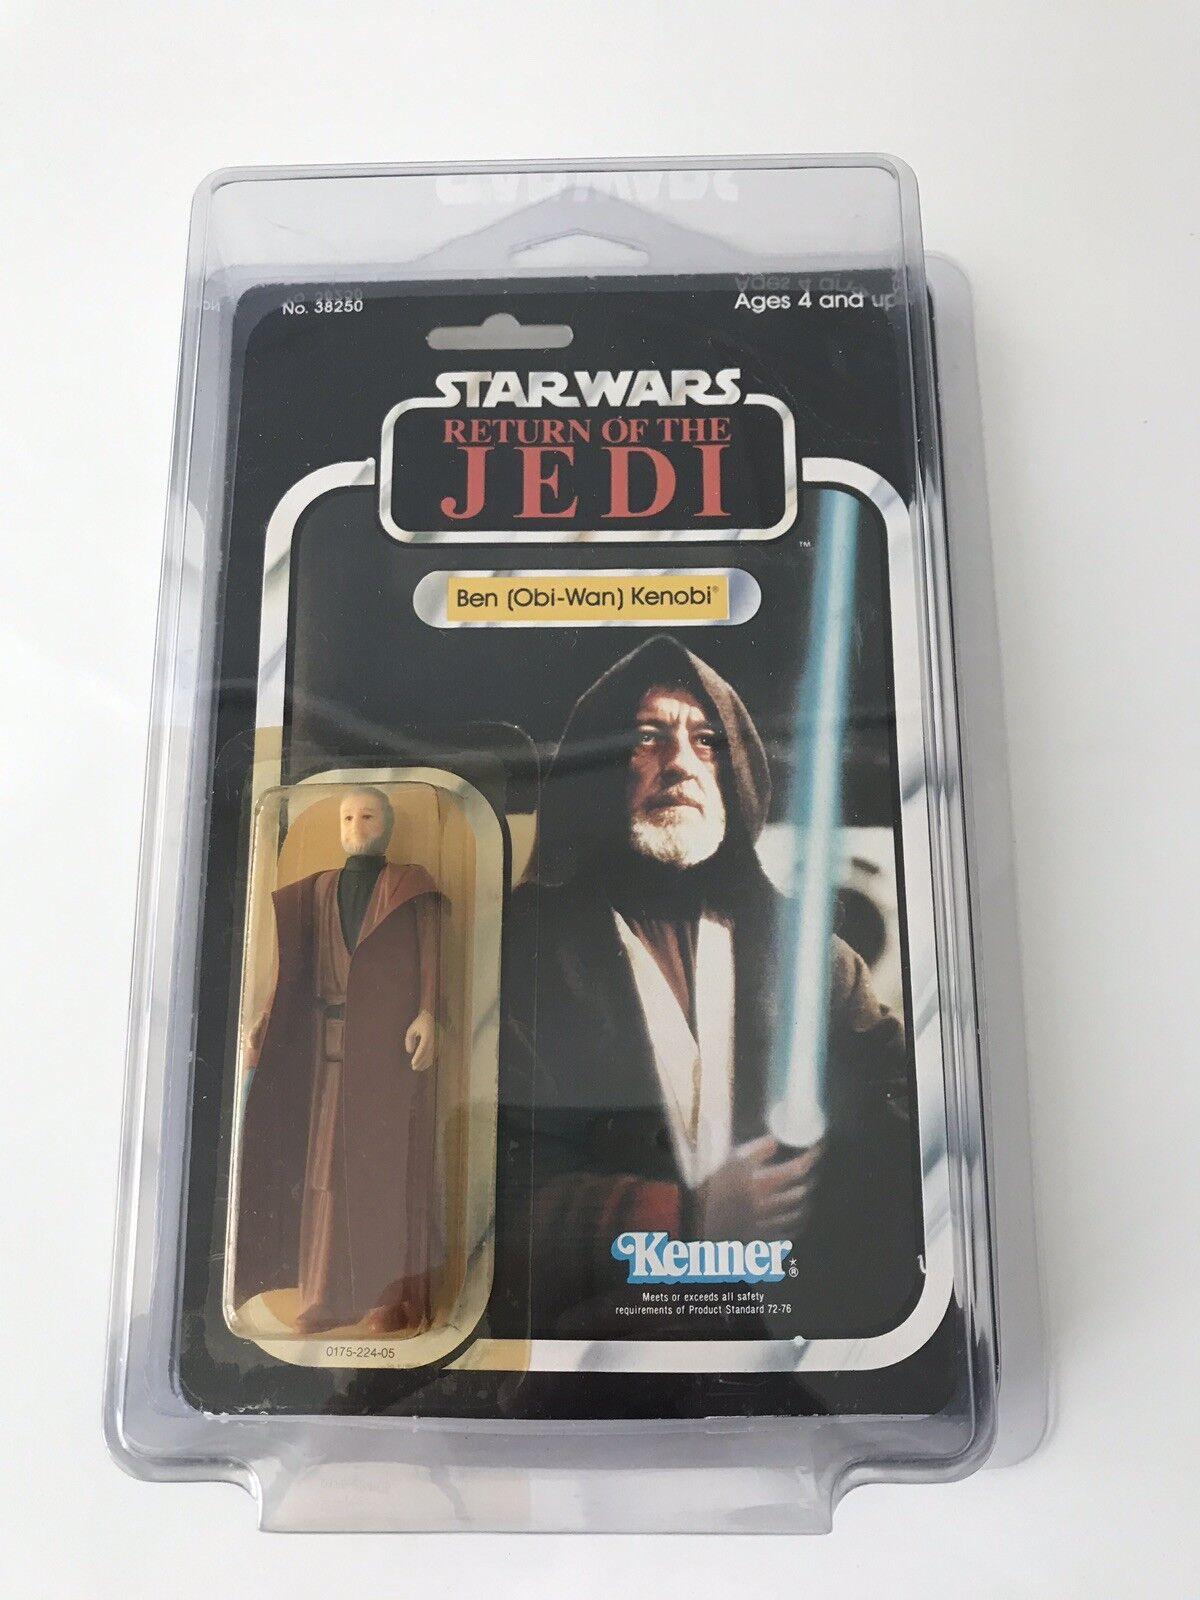 Retro Star wars regreso del Jedi Obi-Wan Kenobi Figura De Acción 77 menta en tarjeta